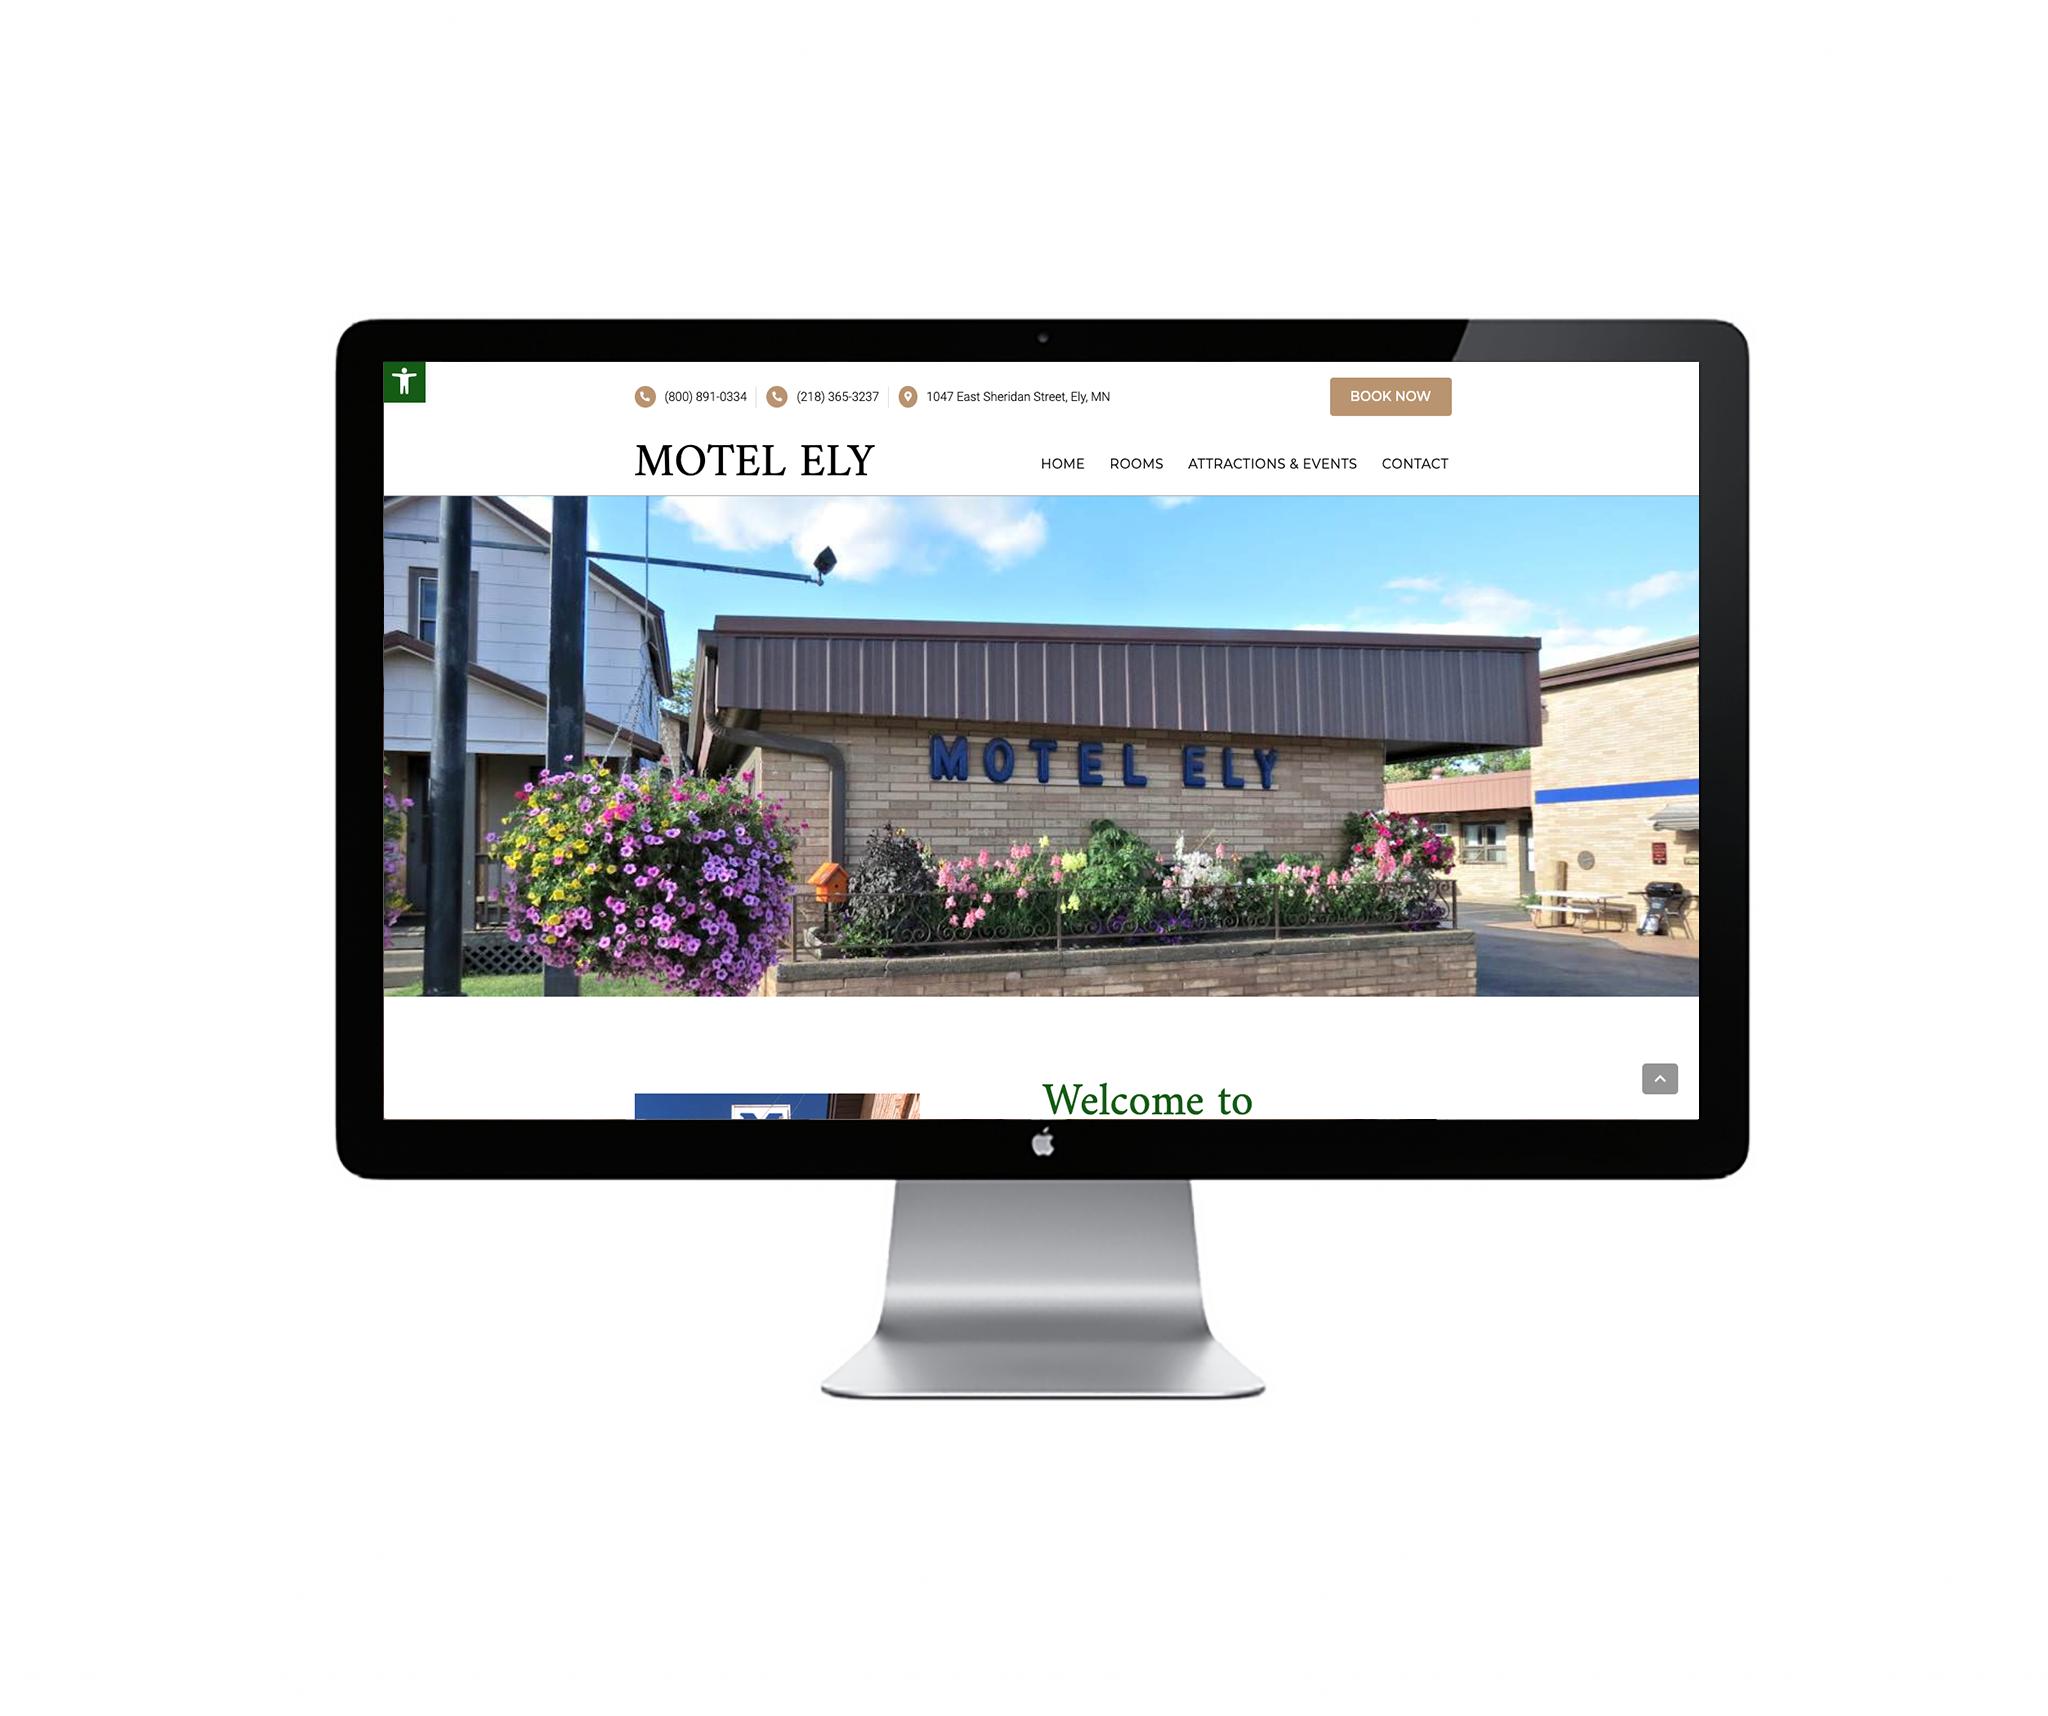 motel ely website